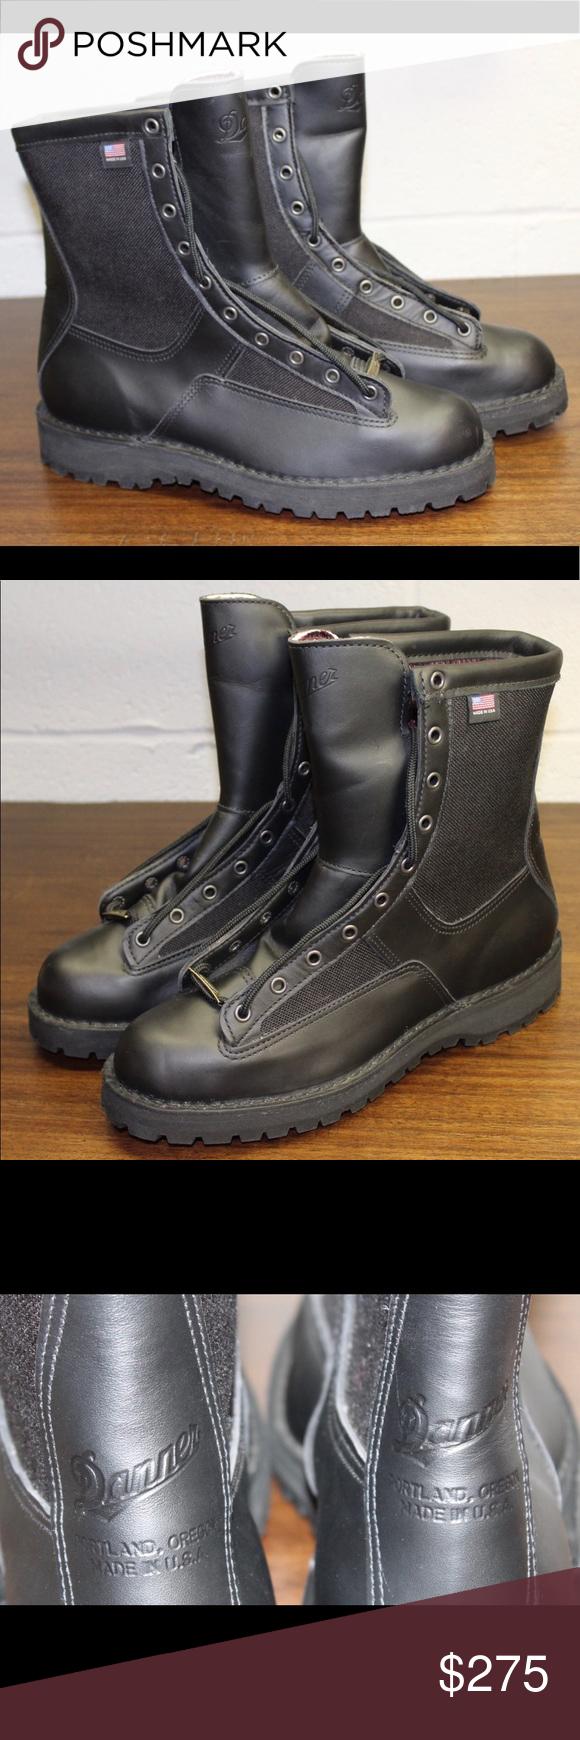 "d4ea5d8c5a1 🚨 Danner Acadia 8"" Military Leather Black Boots Danner Acadia 8 ..."